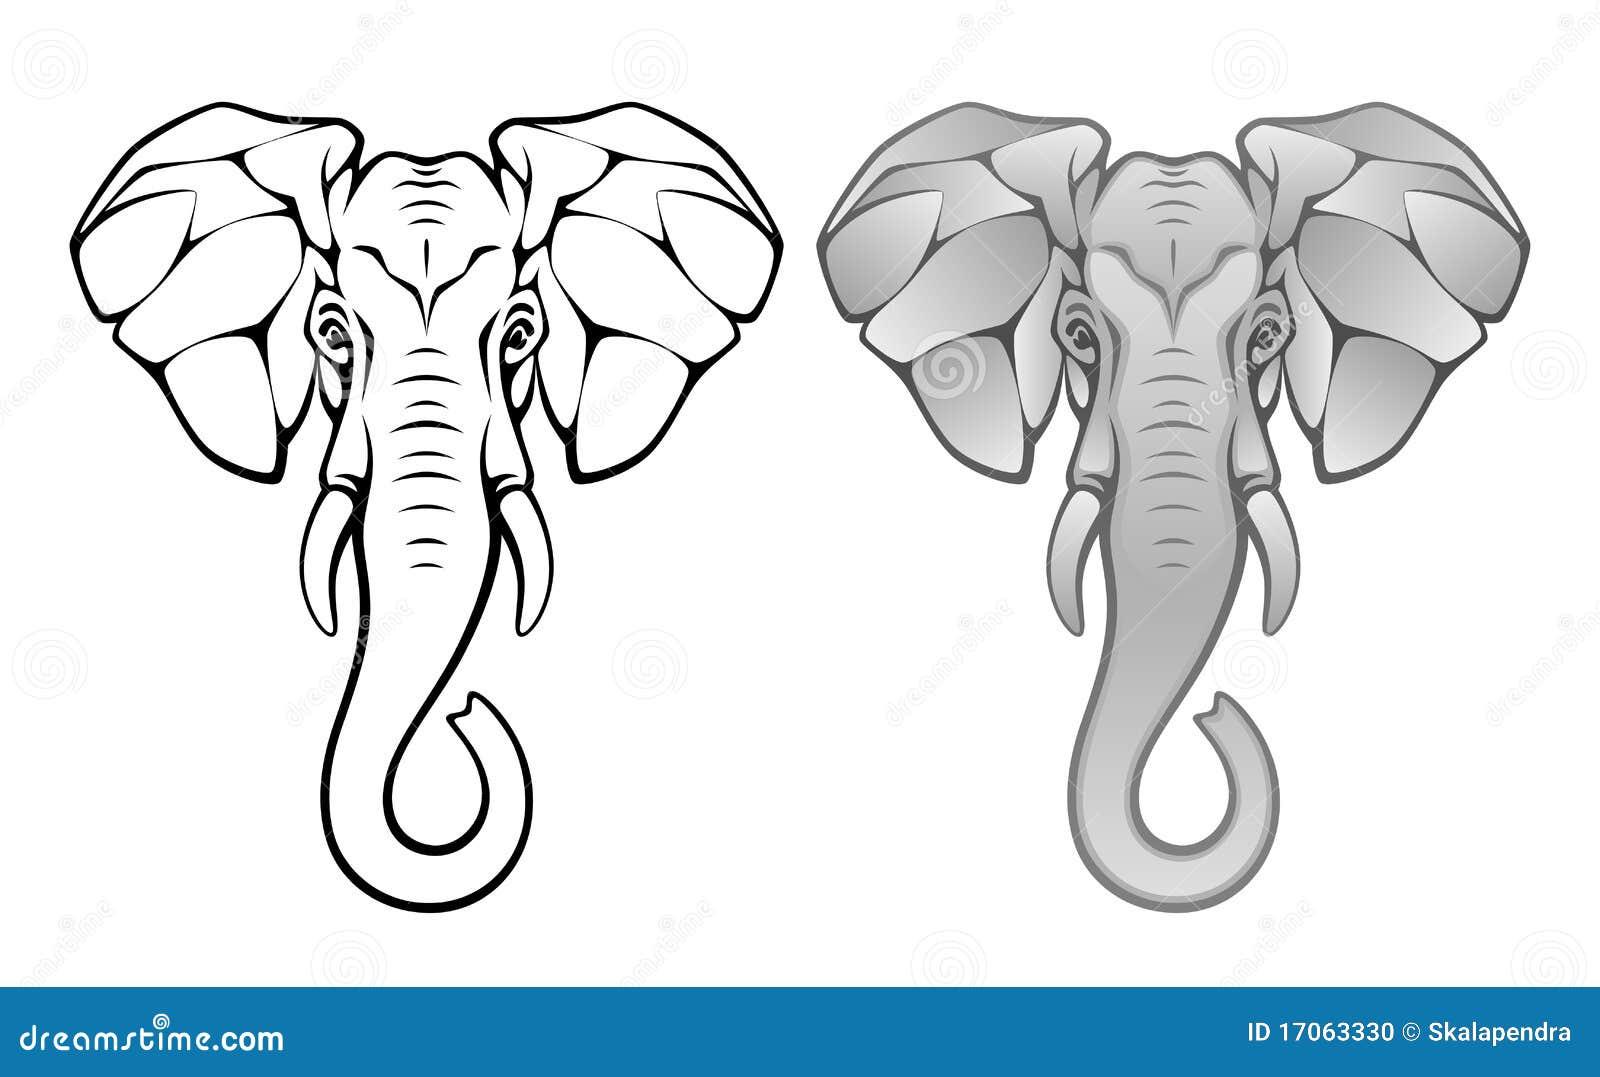 Elephant head on a white background Elephant Head Stencil